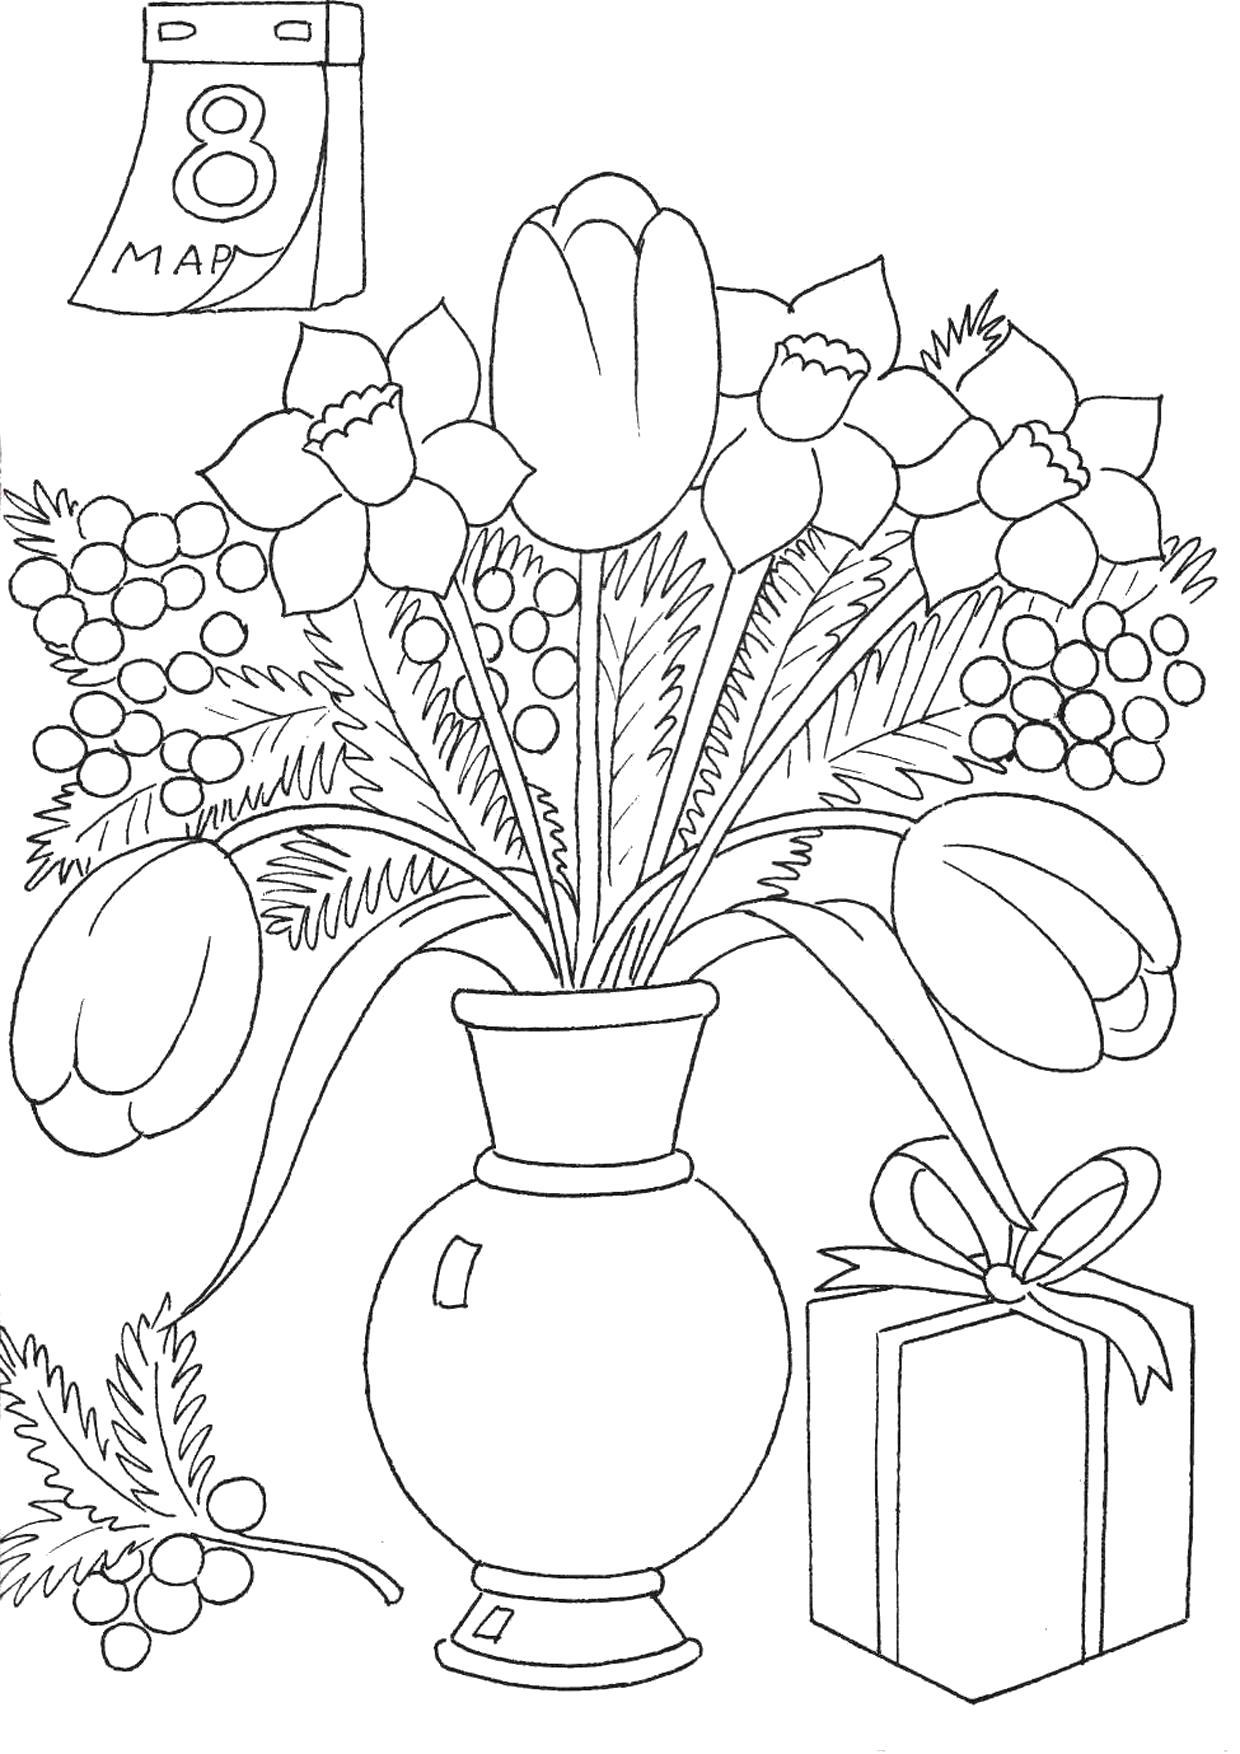 Раскраски Весна, Раскраски картинки для всех возростов.